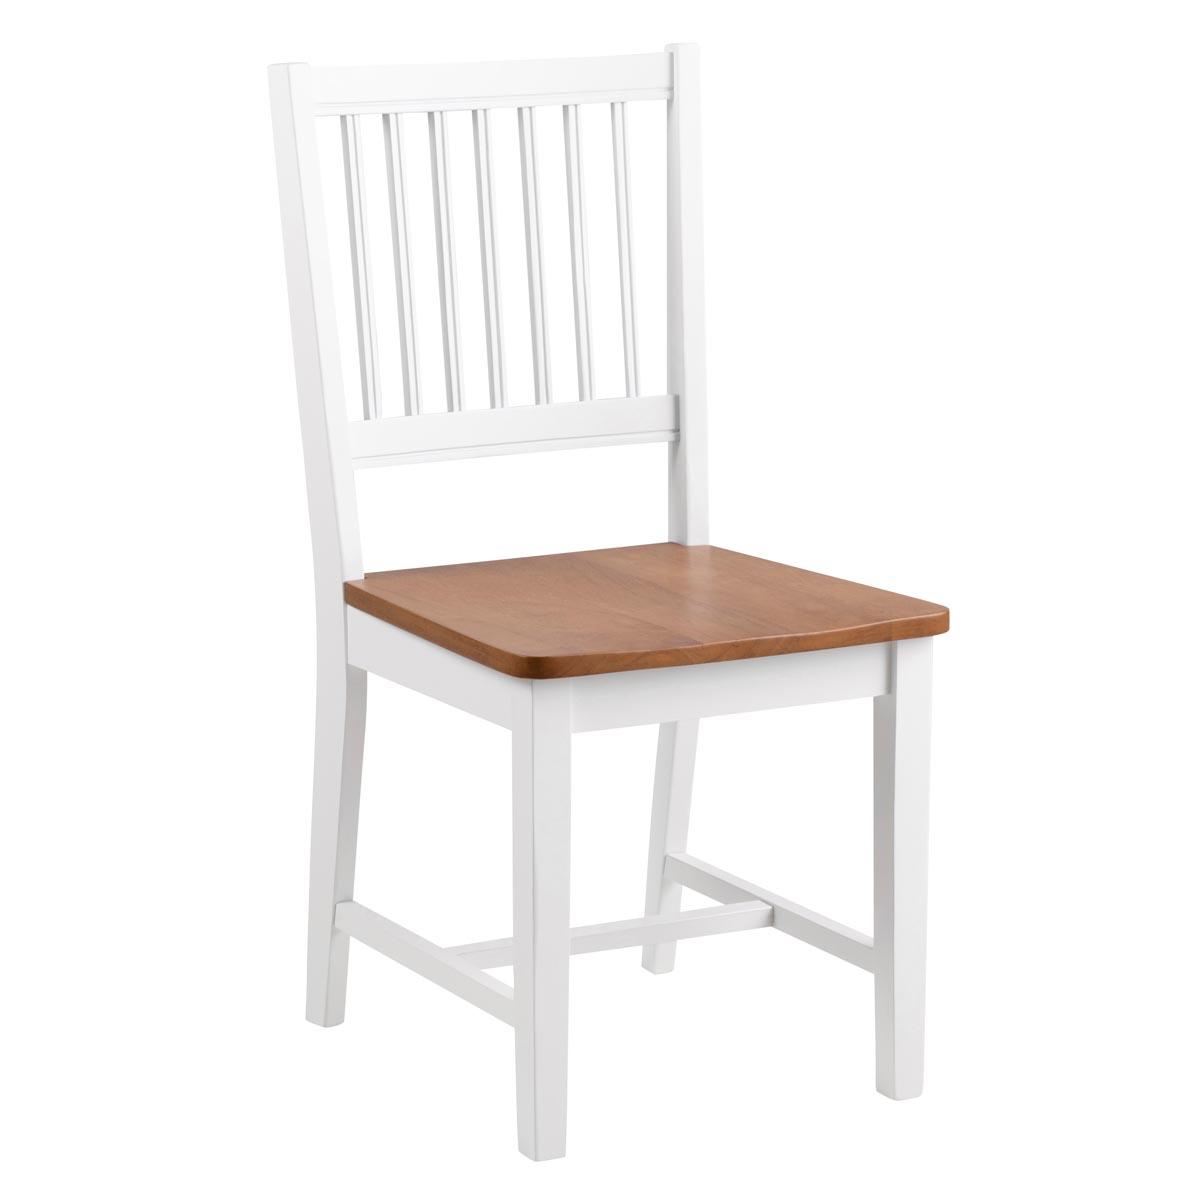 BRISBANE-stol-vinkel1